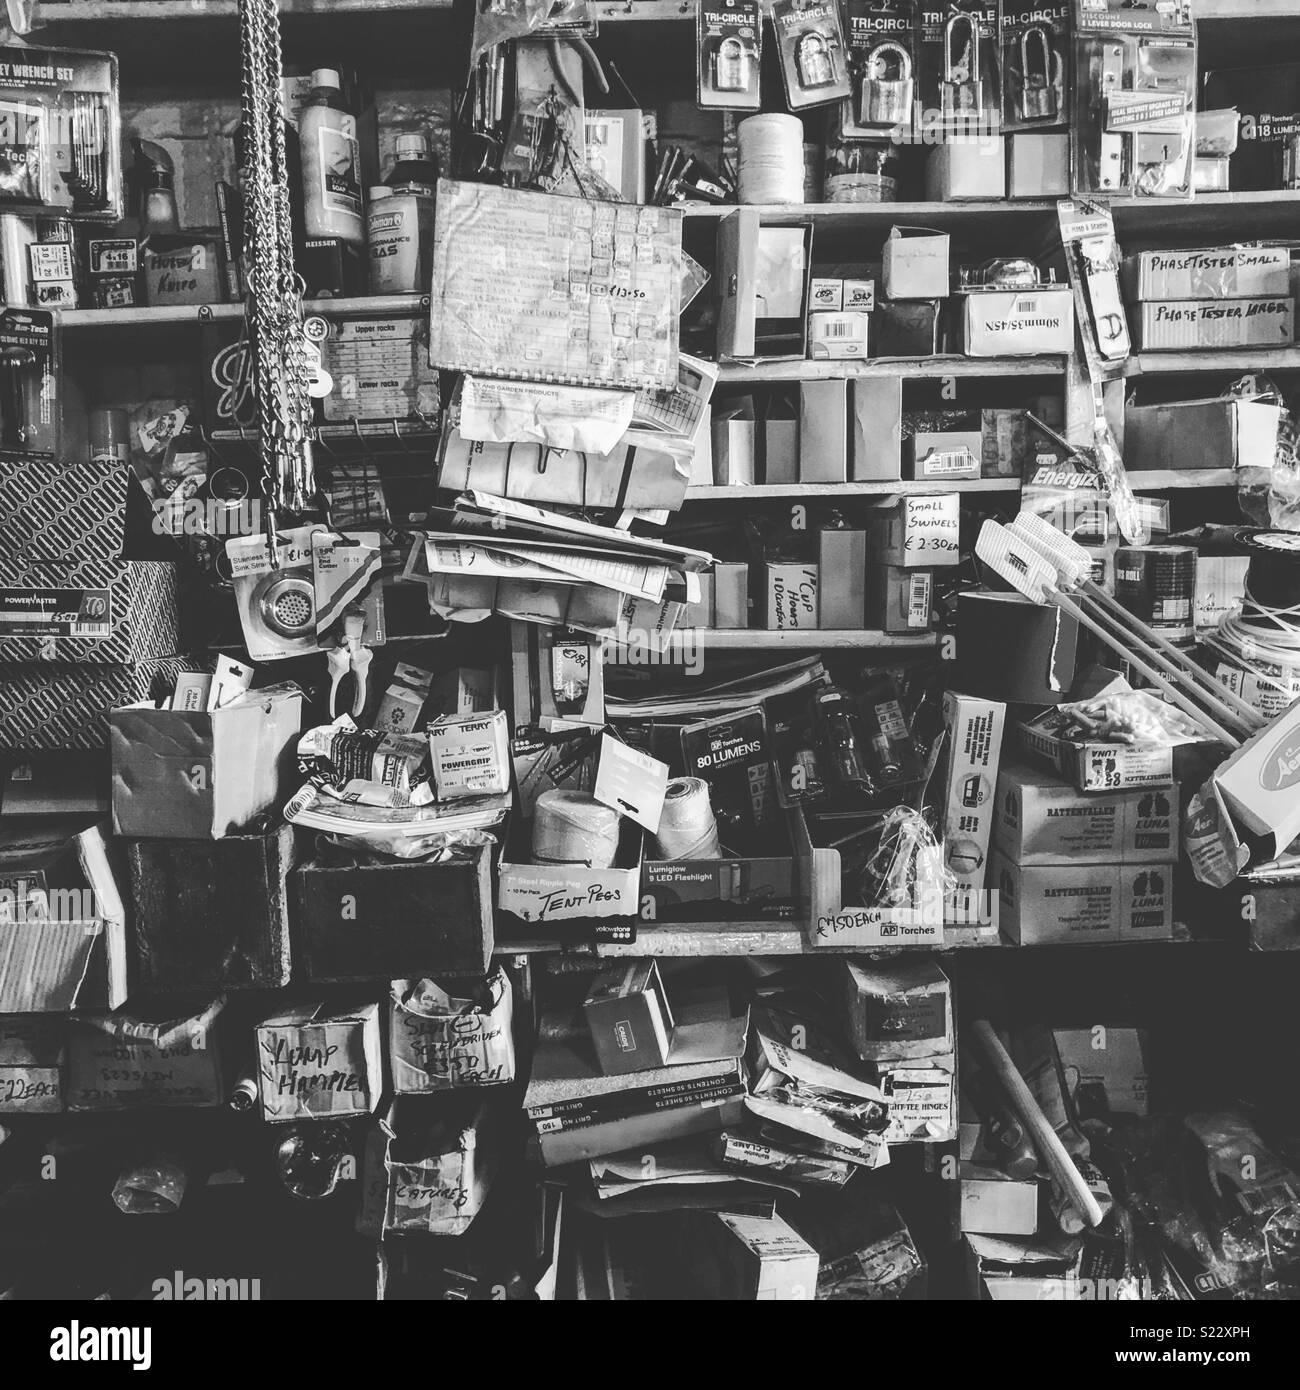 Junk Shop - Stock Image